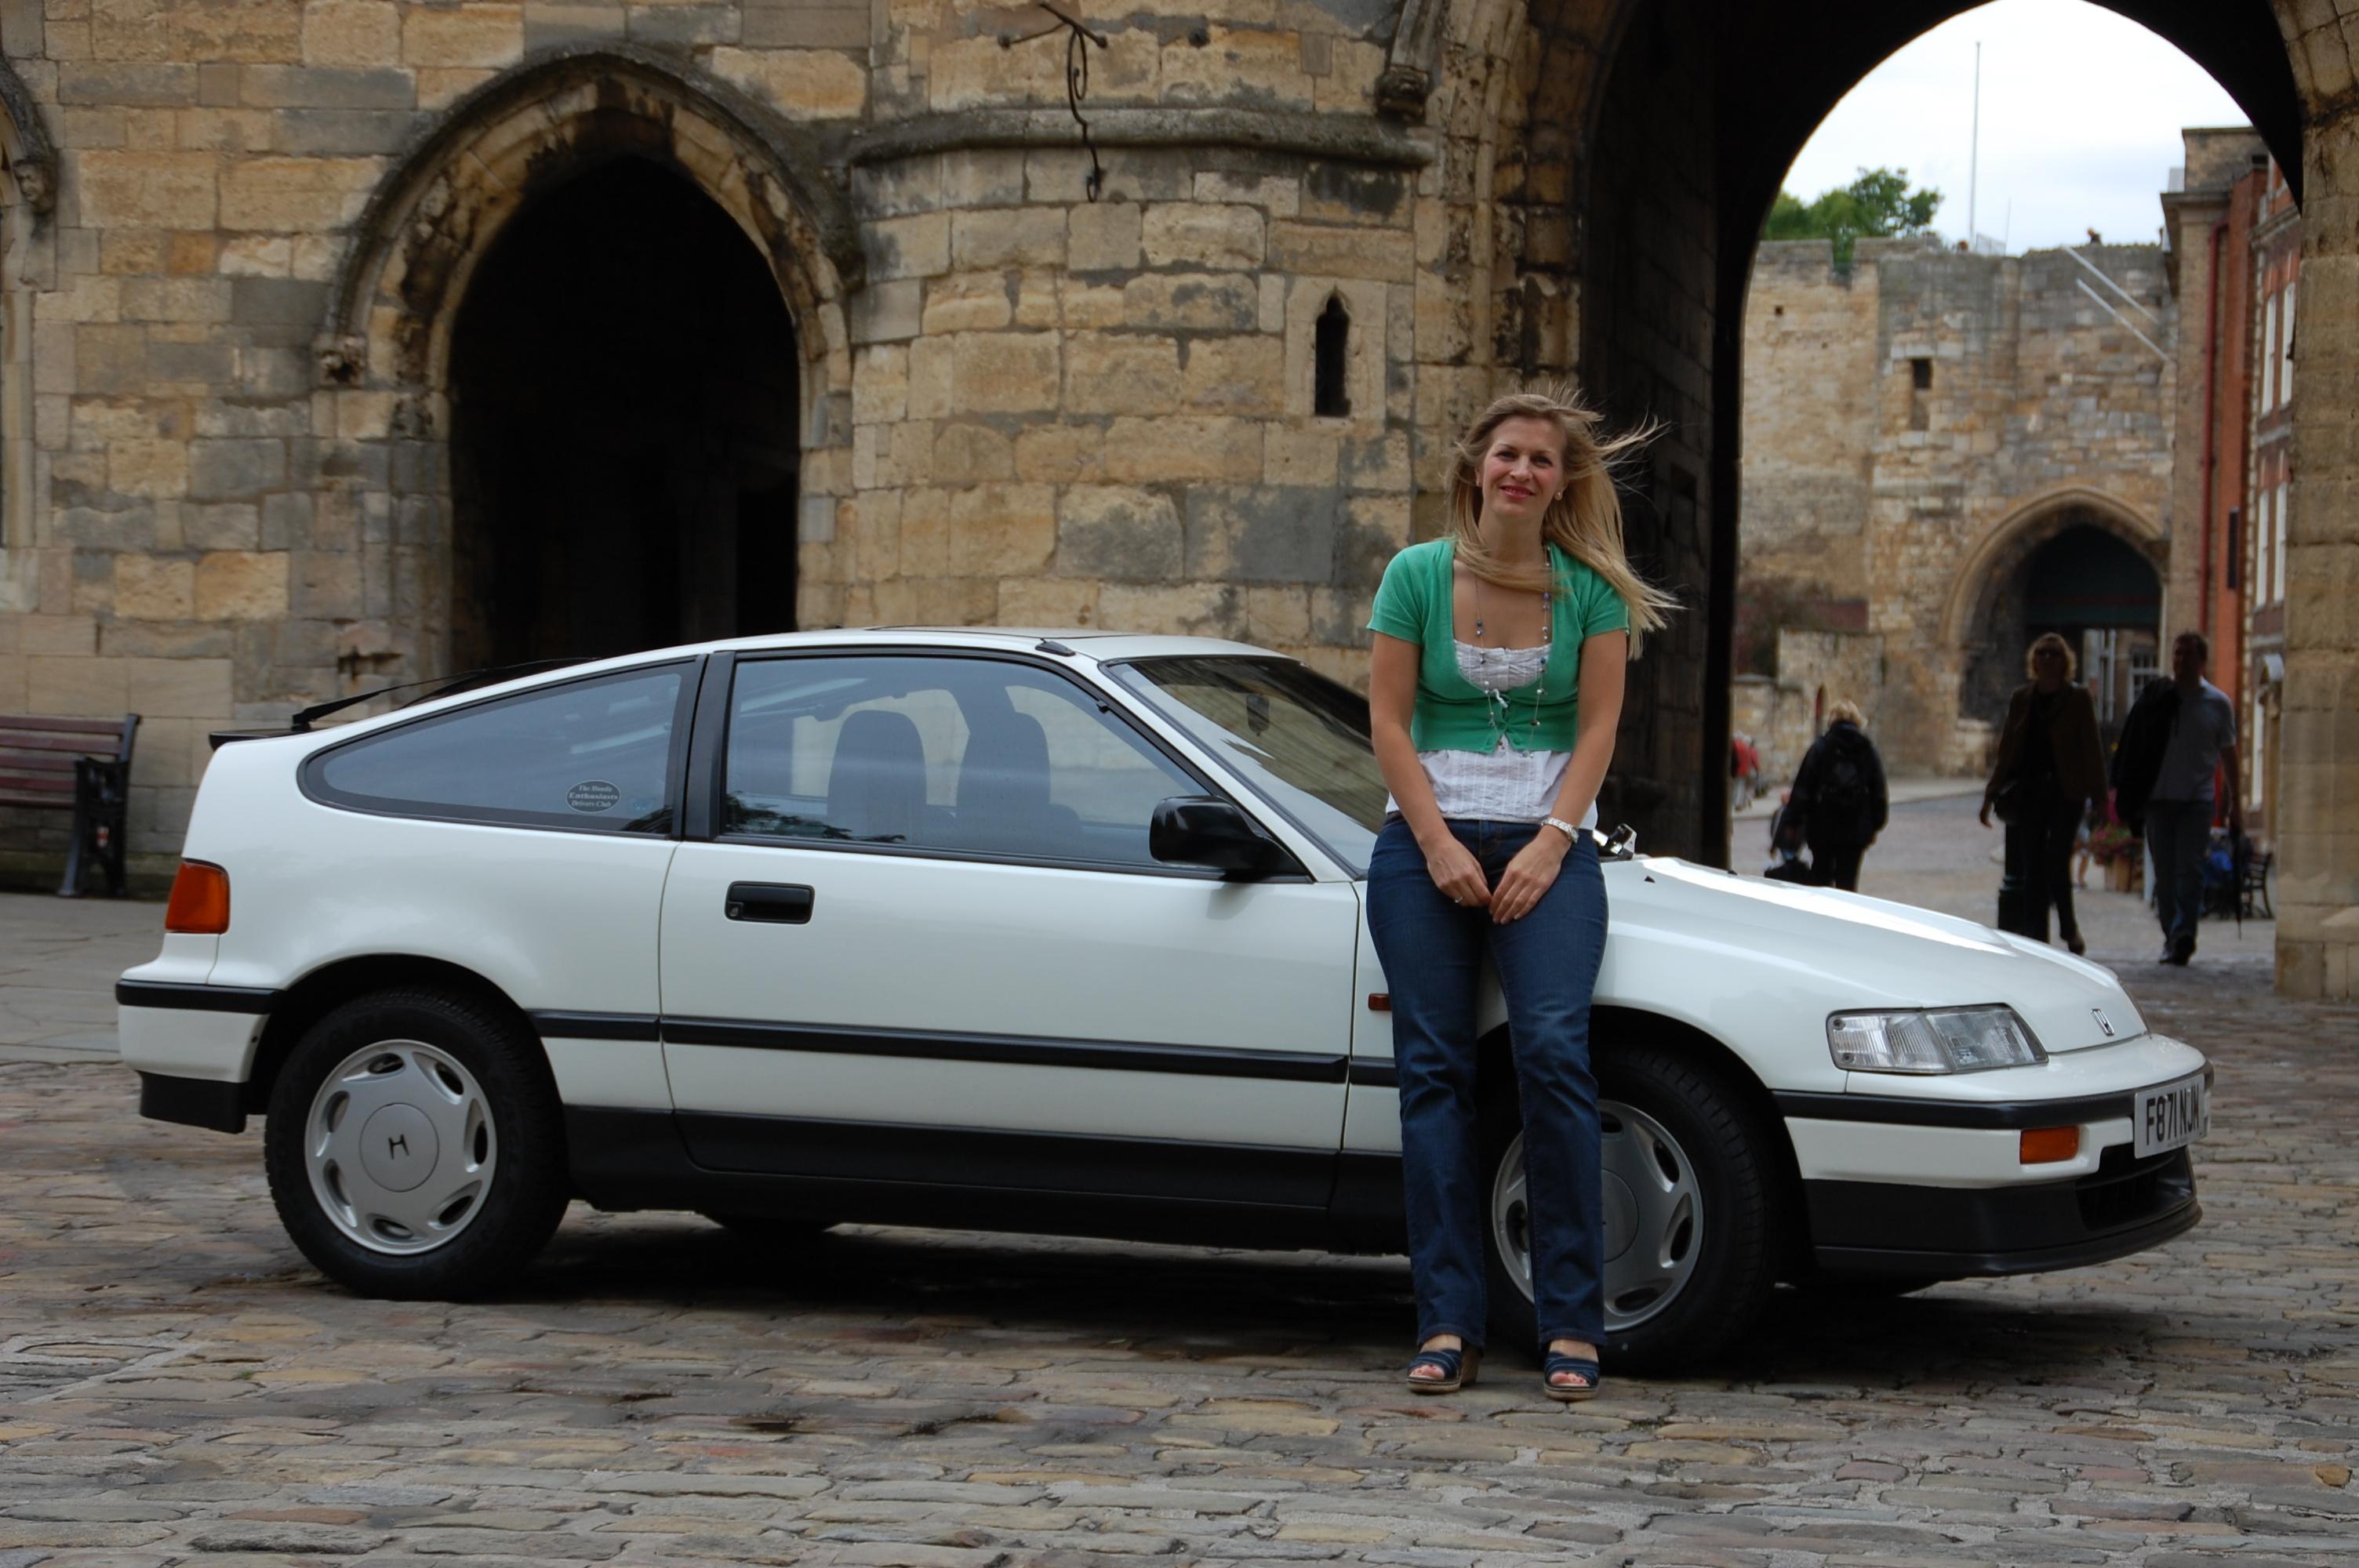 1988 Honda Crx 1 6i 16 Tomorrow S Classic 171 Petroleum Vitae